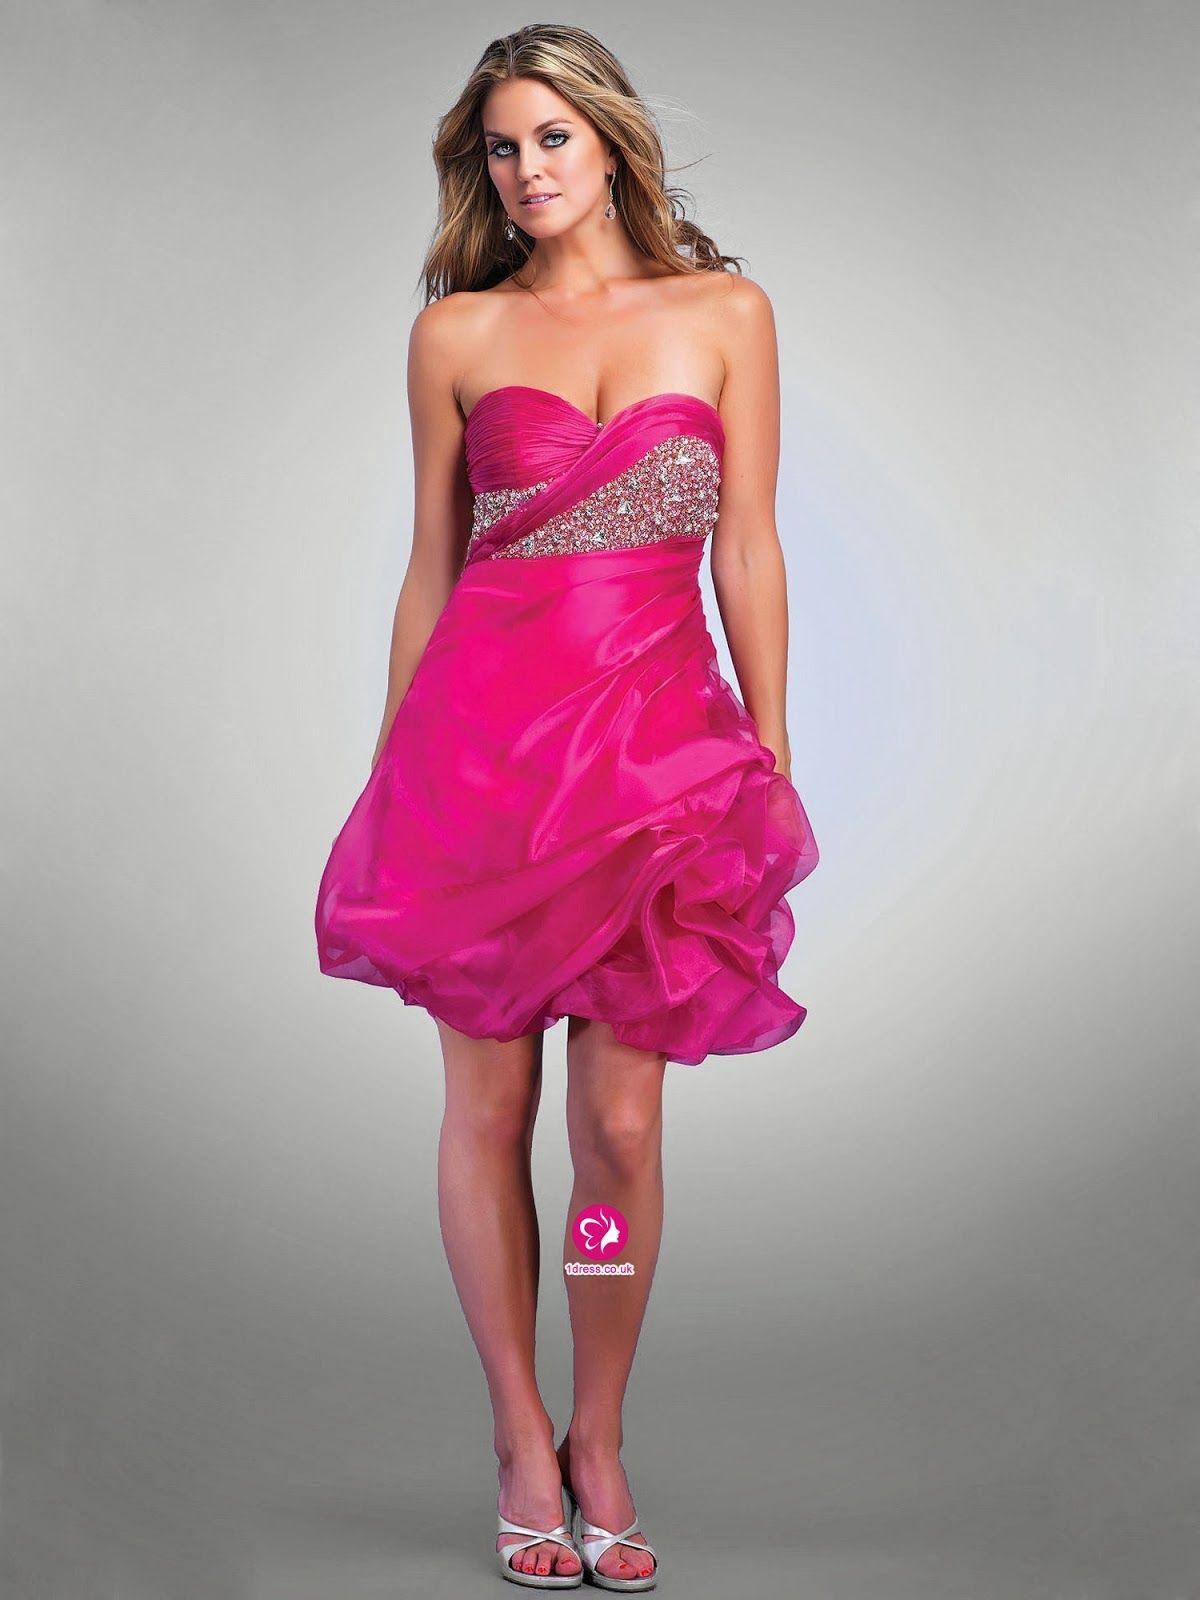 Hermosos vestidos de fiesta 2014 | Modas | Pinterest | Fiestas ...